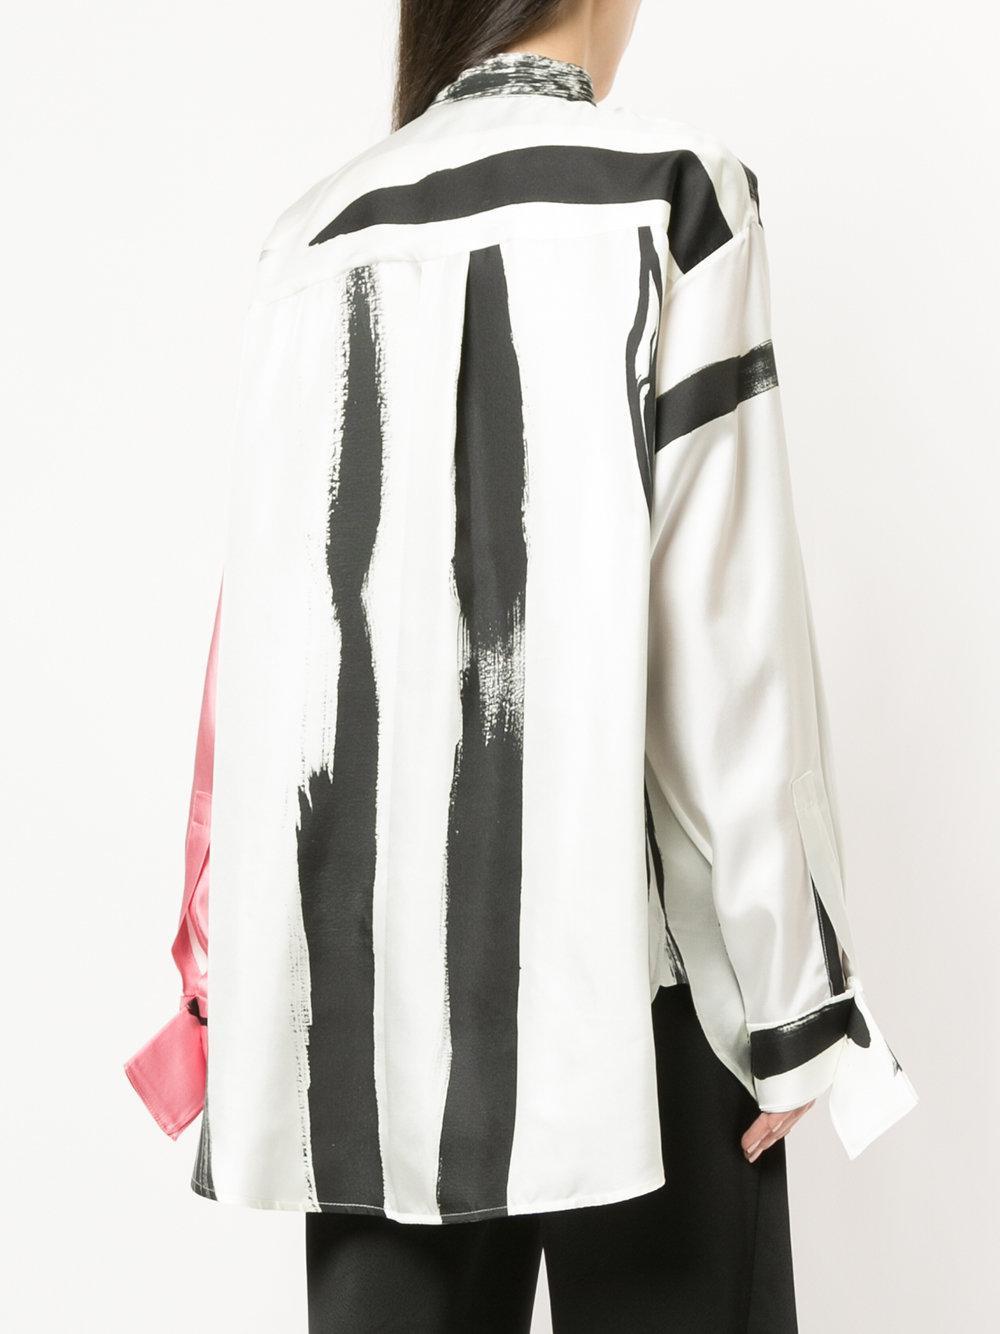 painterly stripe drape detail spaghetti top - White CHRISTOPHER ESBER Cheap Sale 100% Authentic K5QMUl